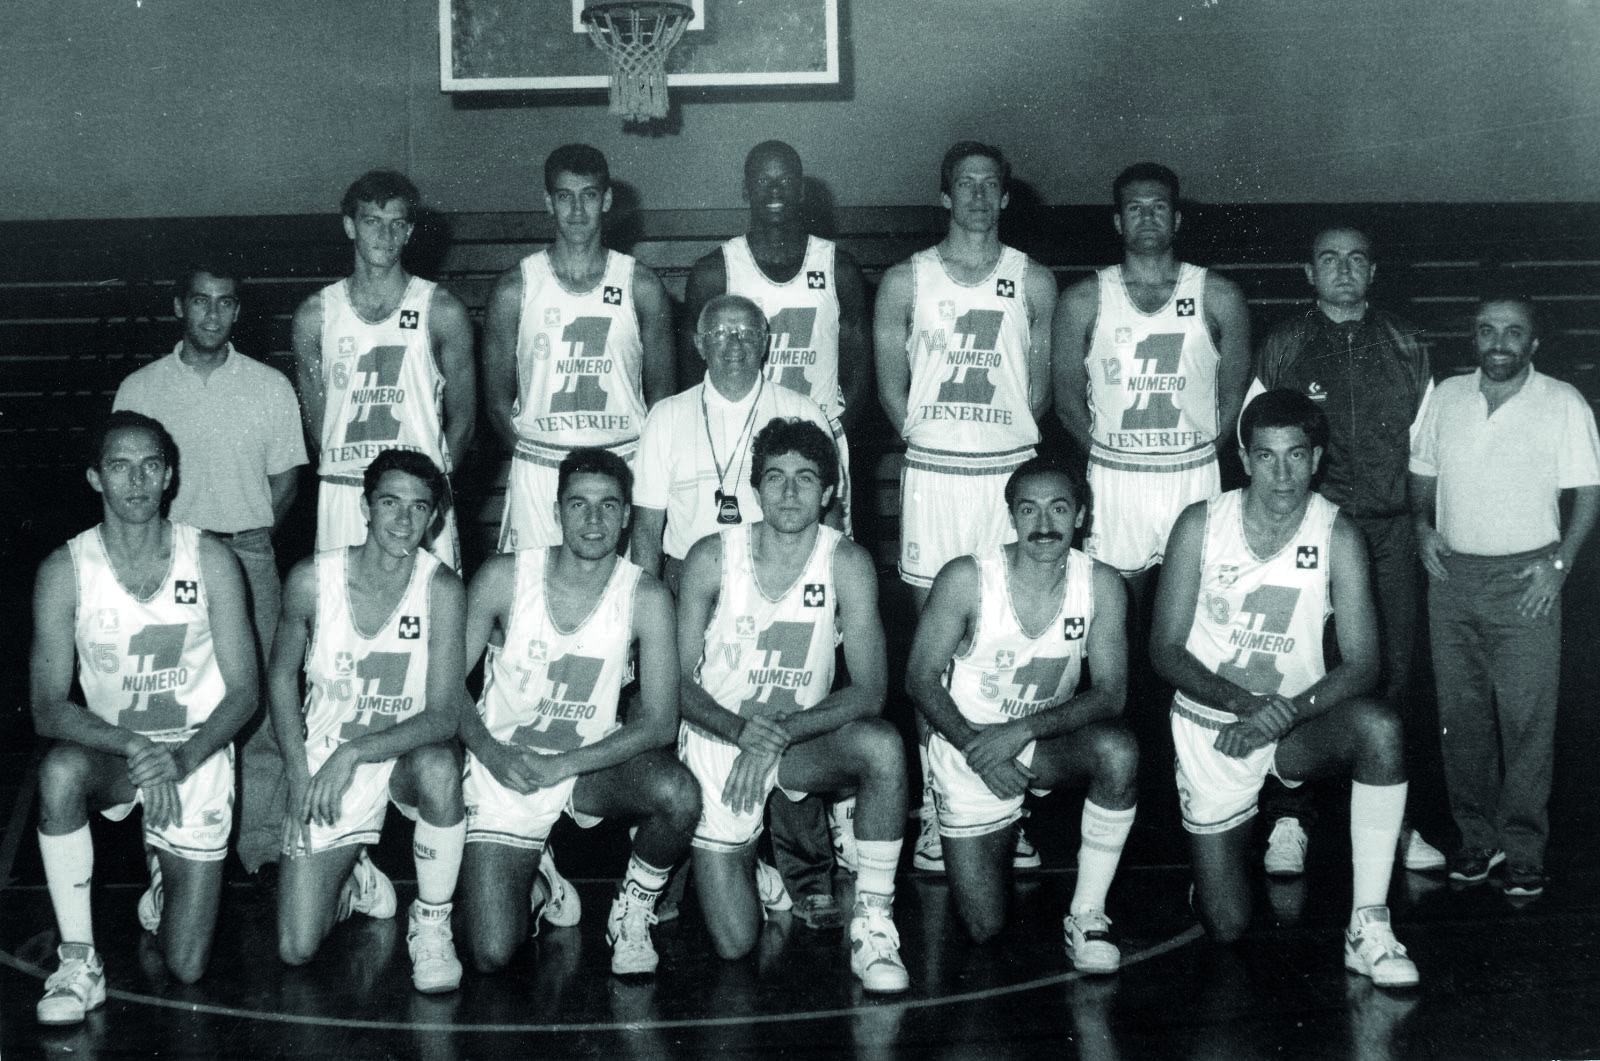 Foto 01 (Tenerife 88-89) El Diario de Avisos